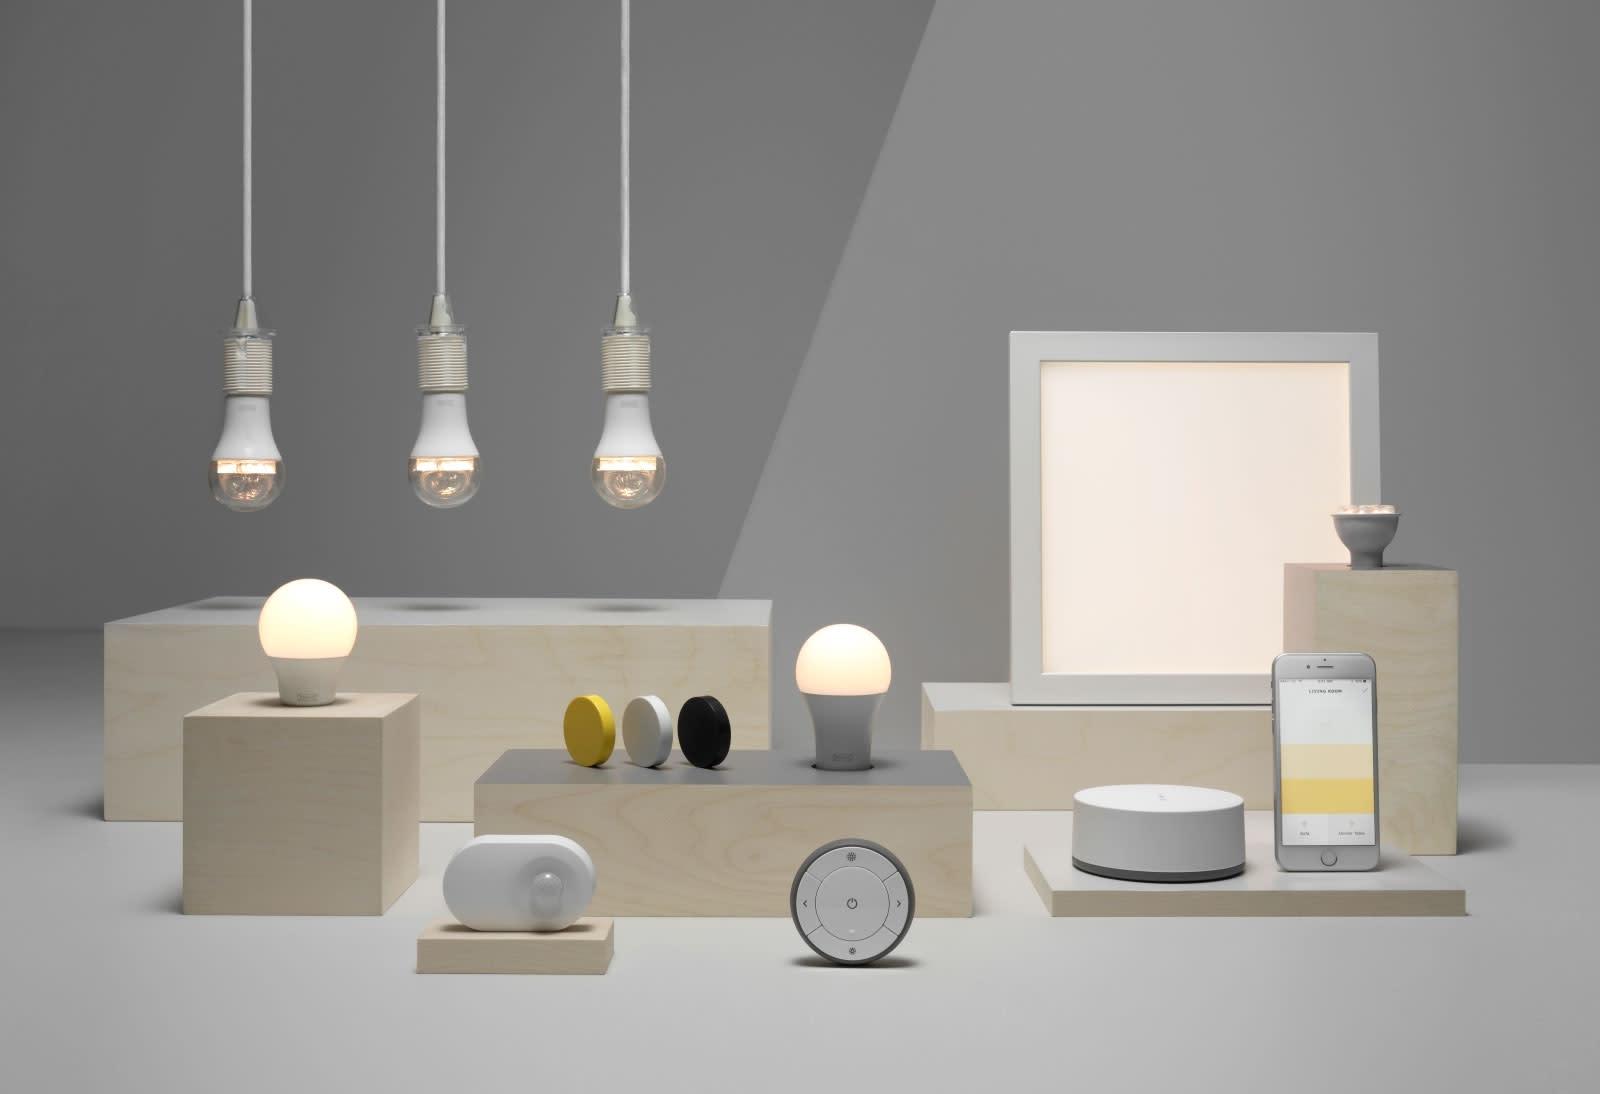 Ikea S Smart Lighting Officially